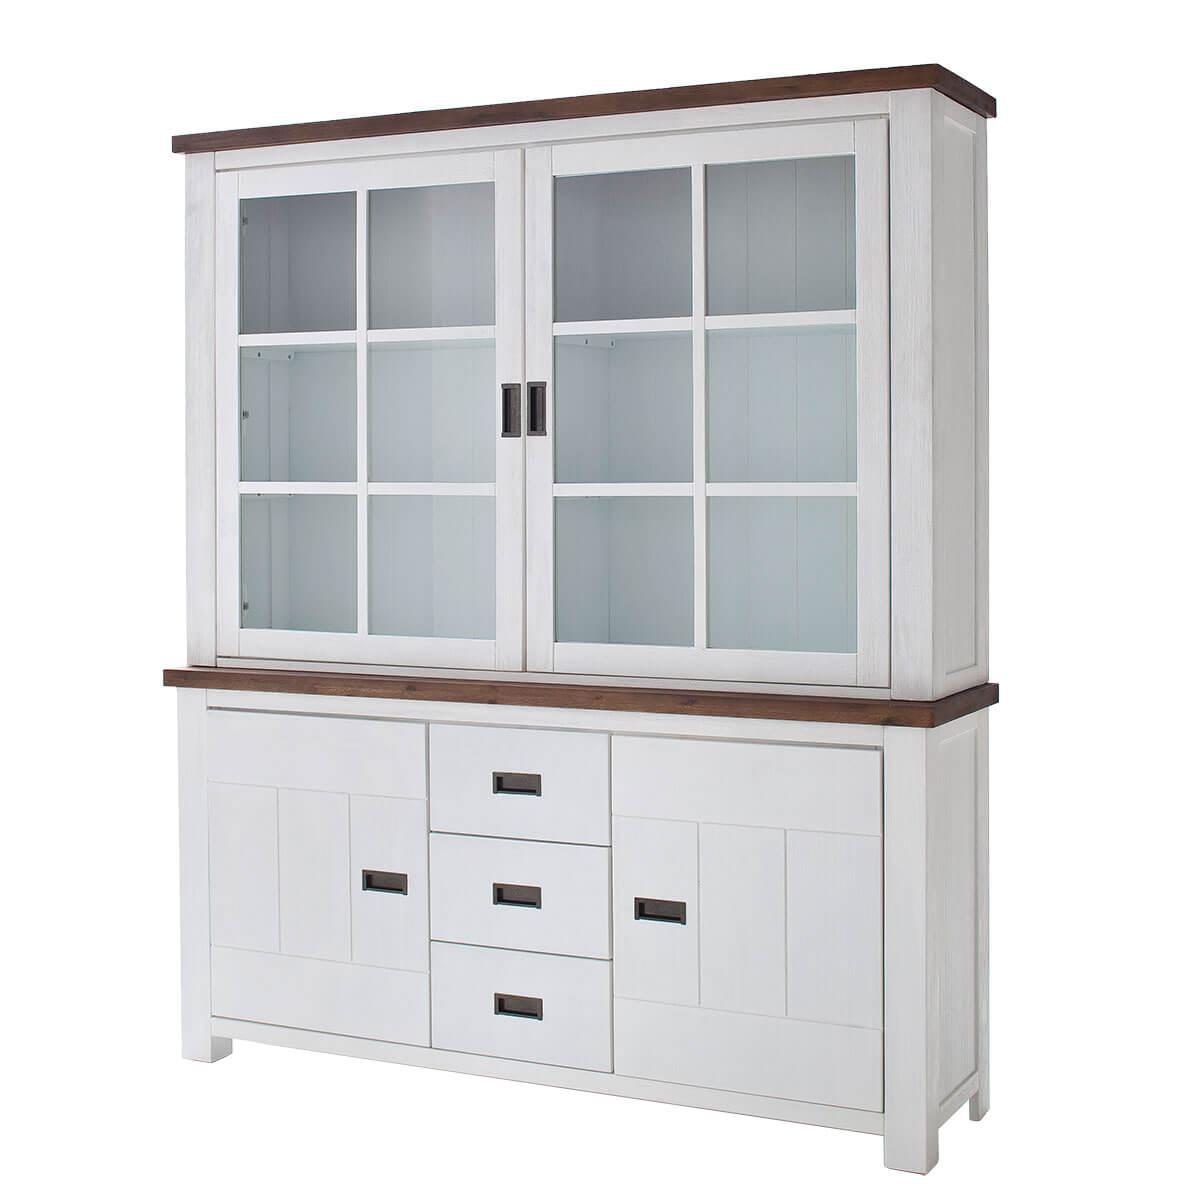 buffet wei landhaus massivholz buffetschrank vitrine. Black Bedroom Furniture Sets. Home Design Ideas